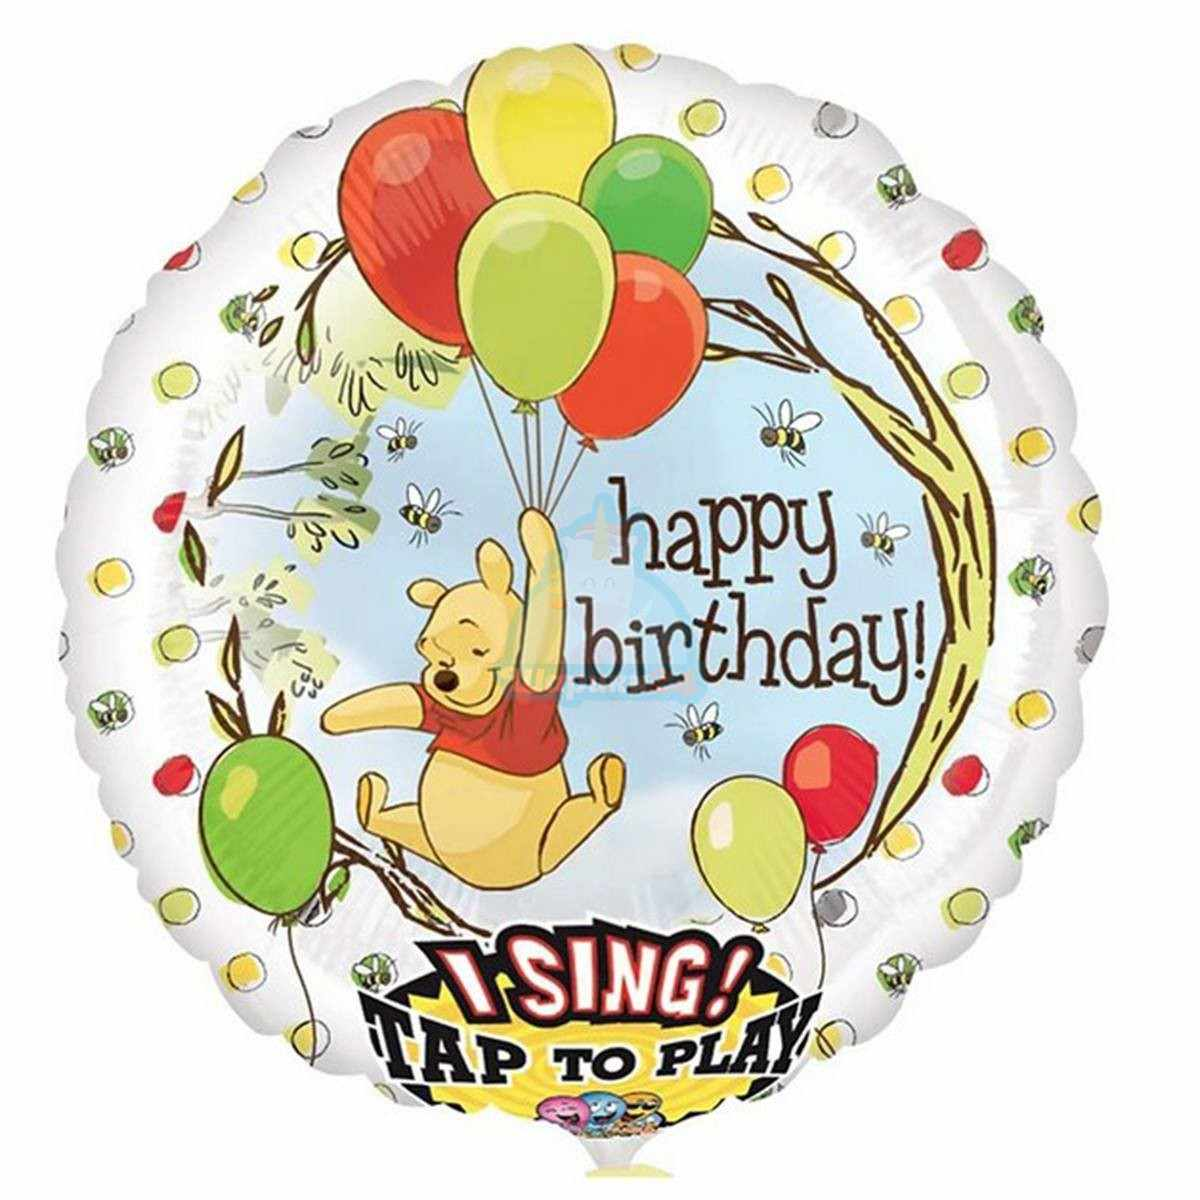 Поющий шар Happy Birthday Винни Пух с шарами фото в интернет-магазине Шарики 24